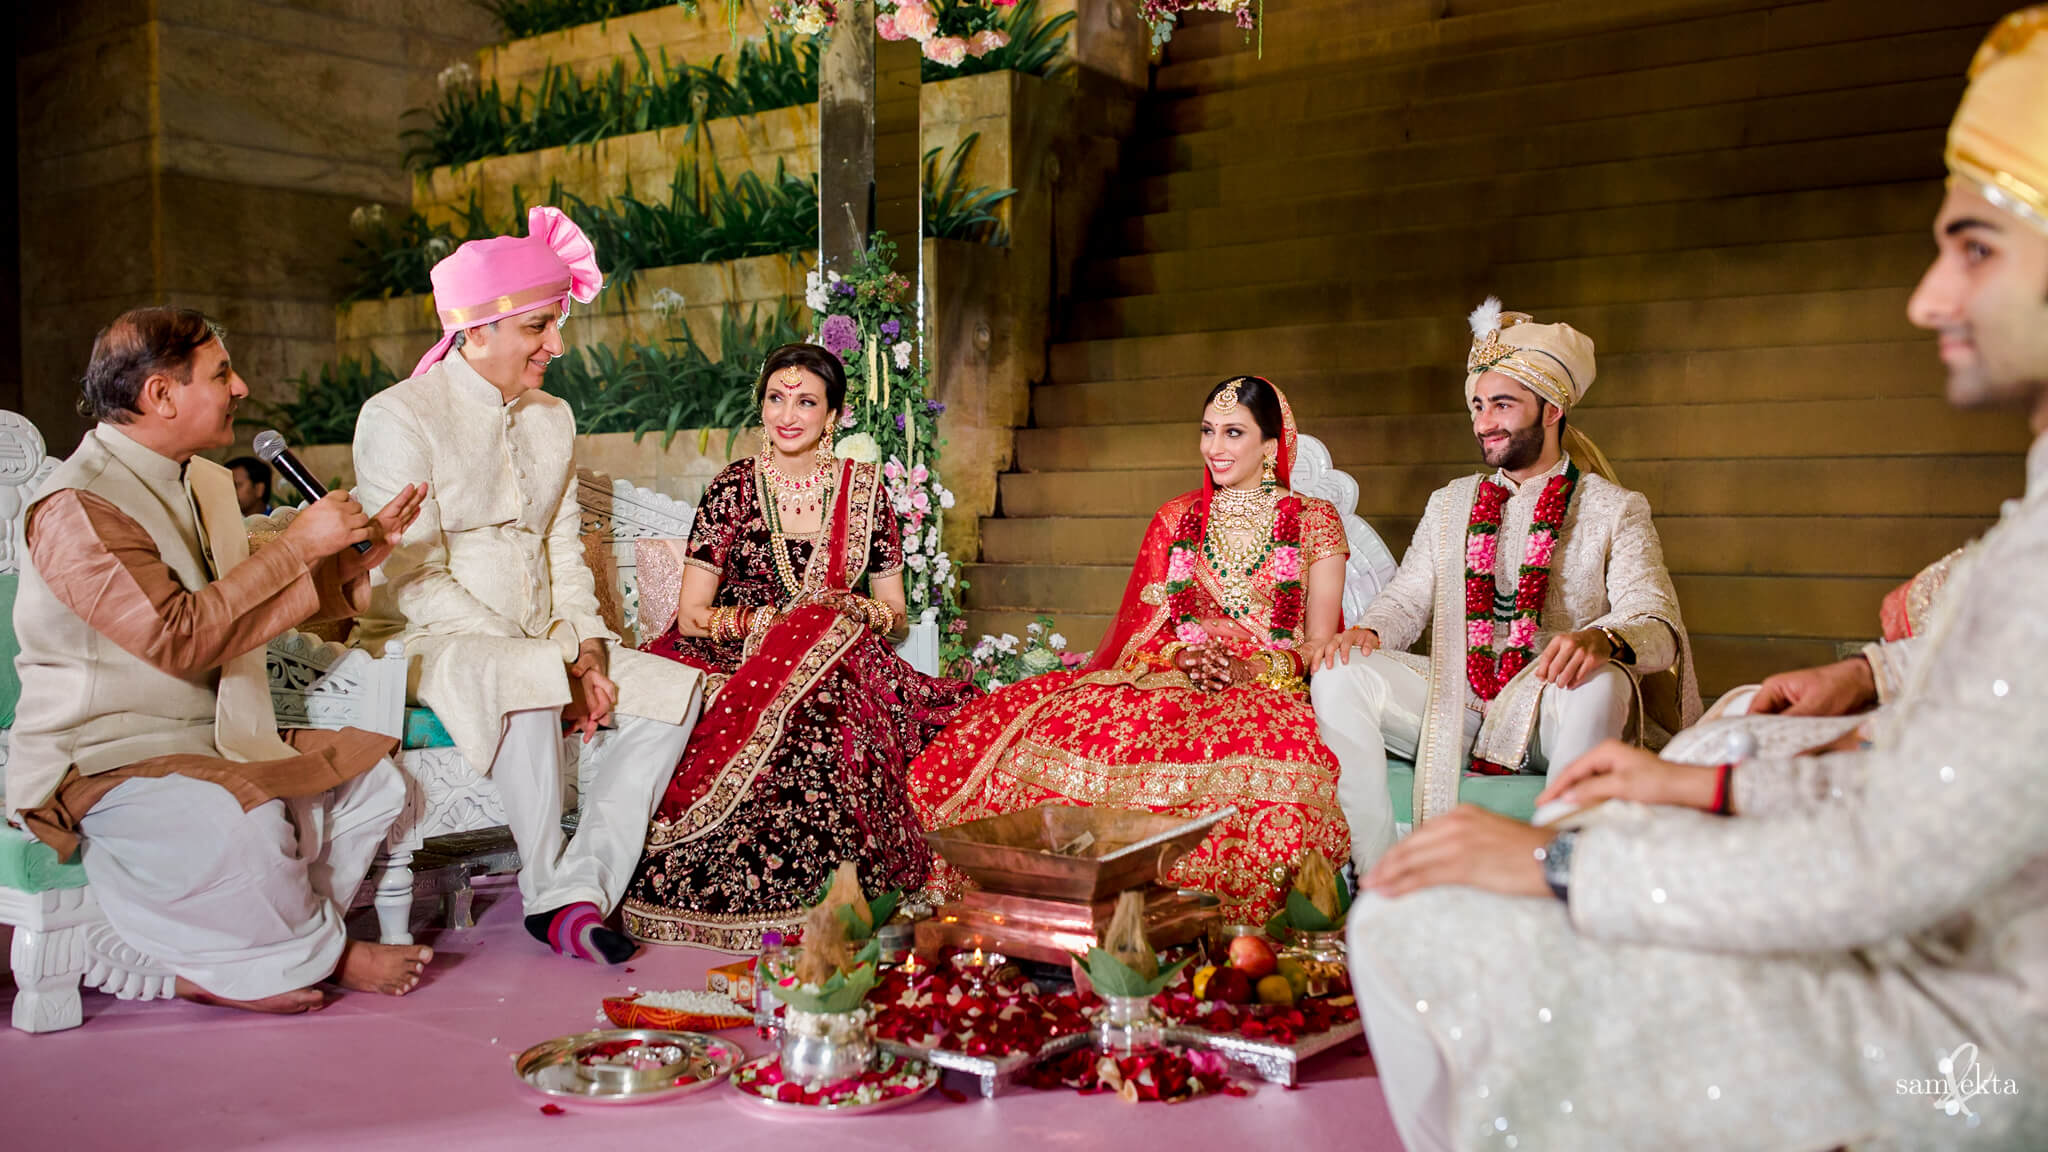 weding rituals, Armaan Jain And Anissa Malhotra's Wedding